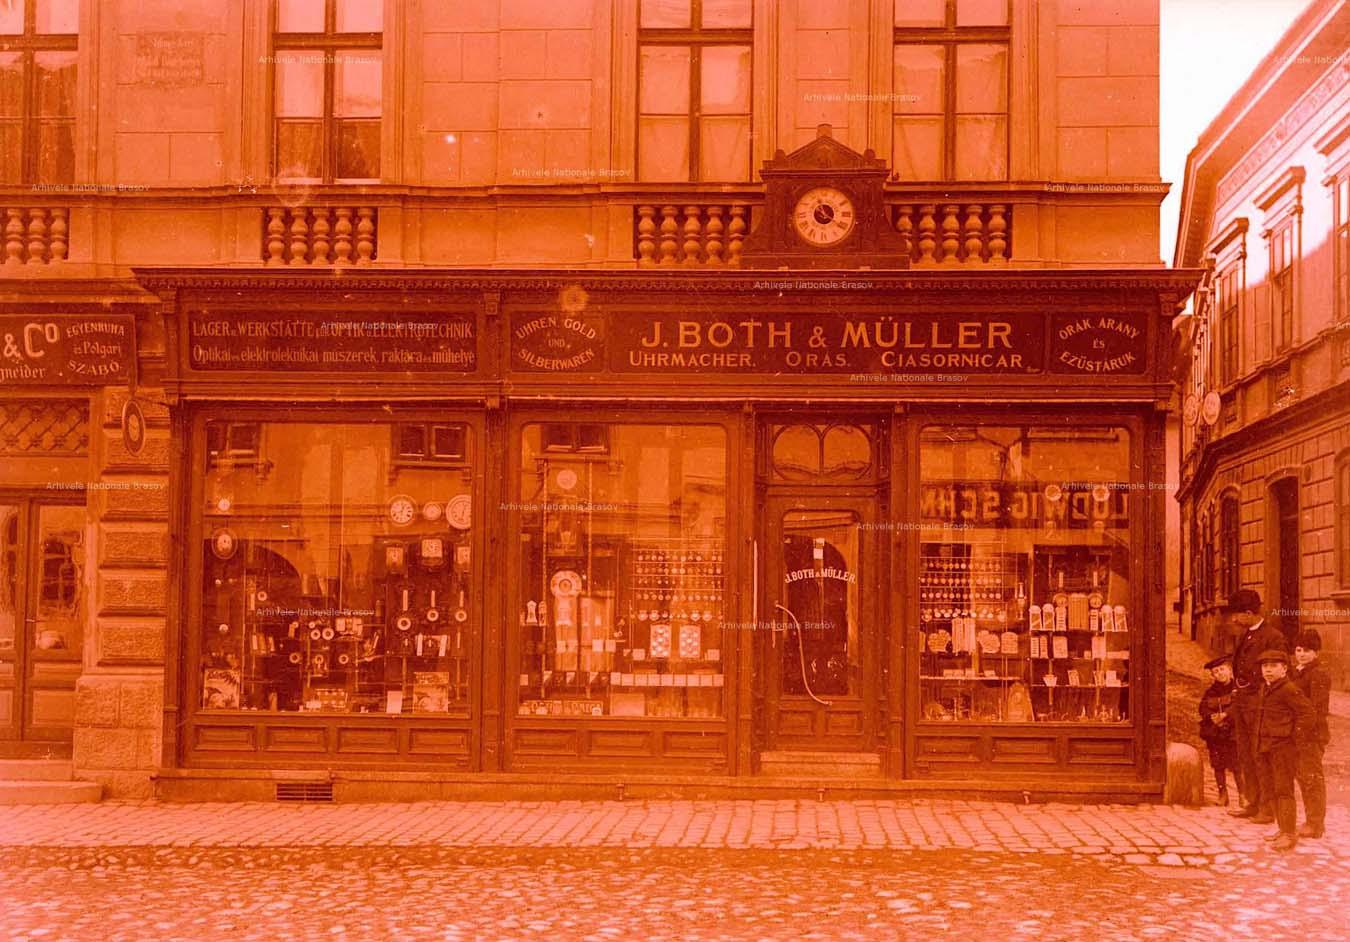 J. Both u. Muller | Brasov